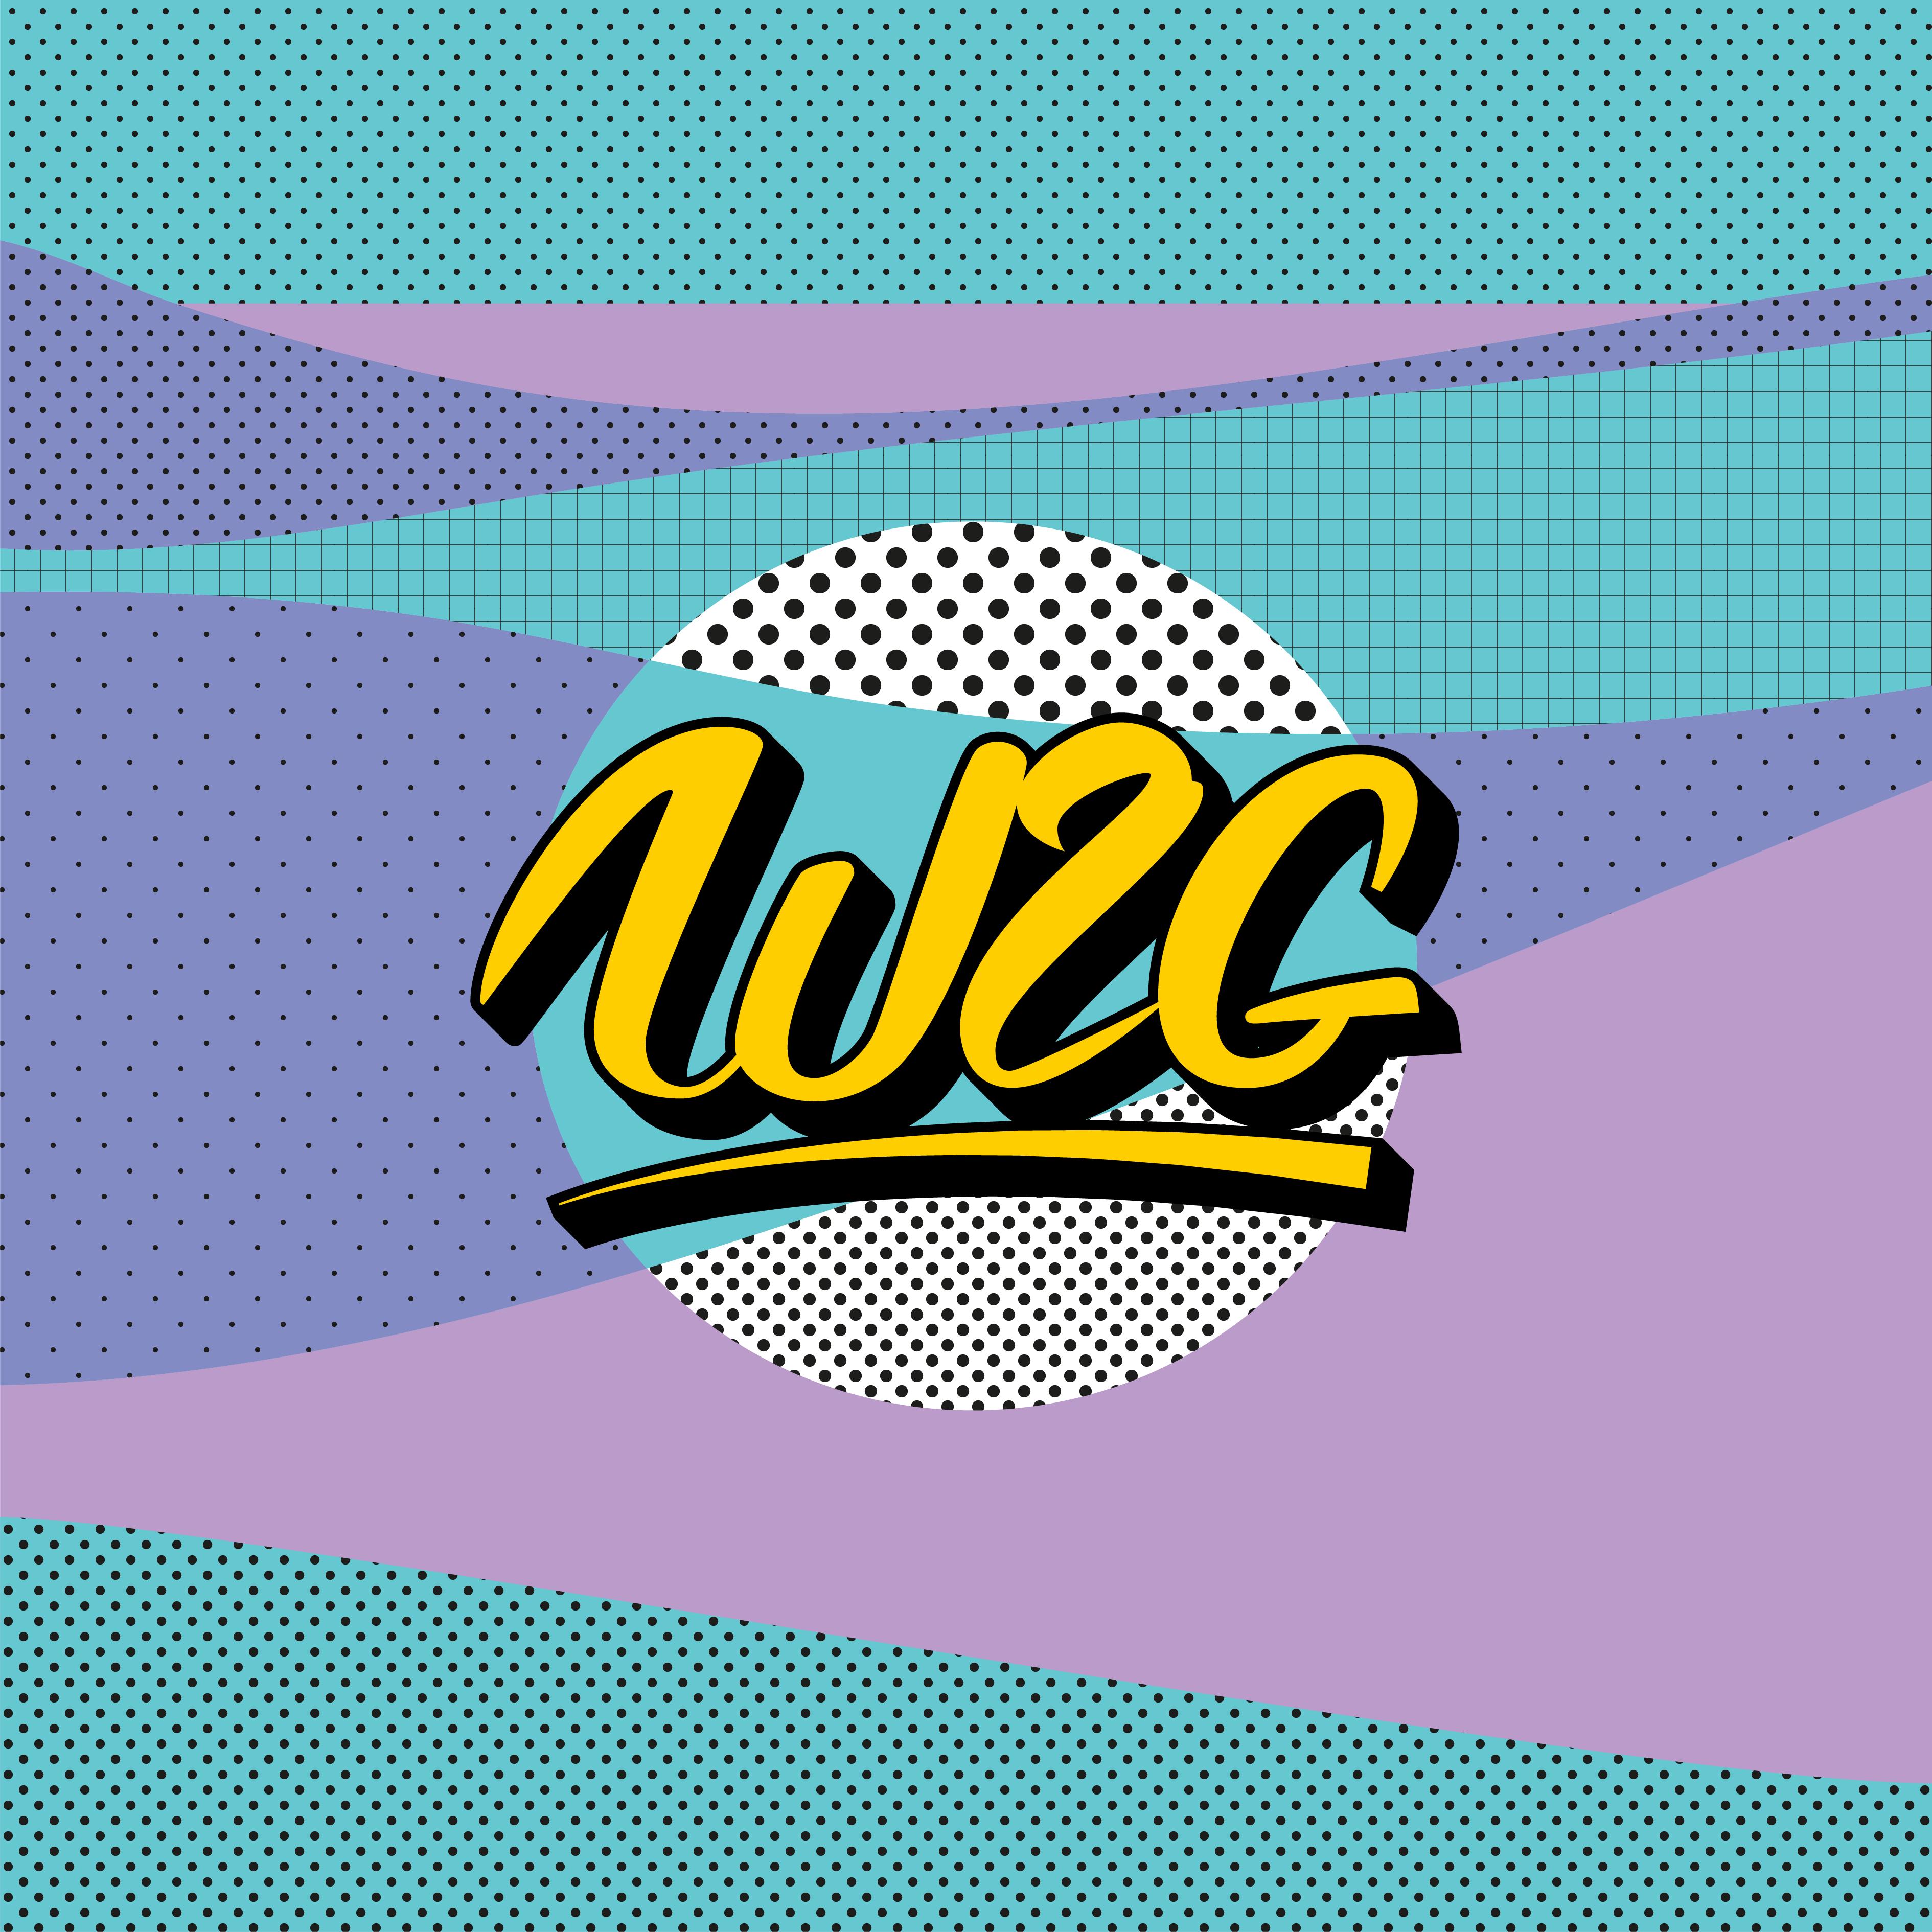 W2G-Identité copie-01